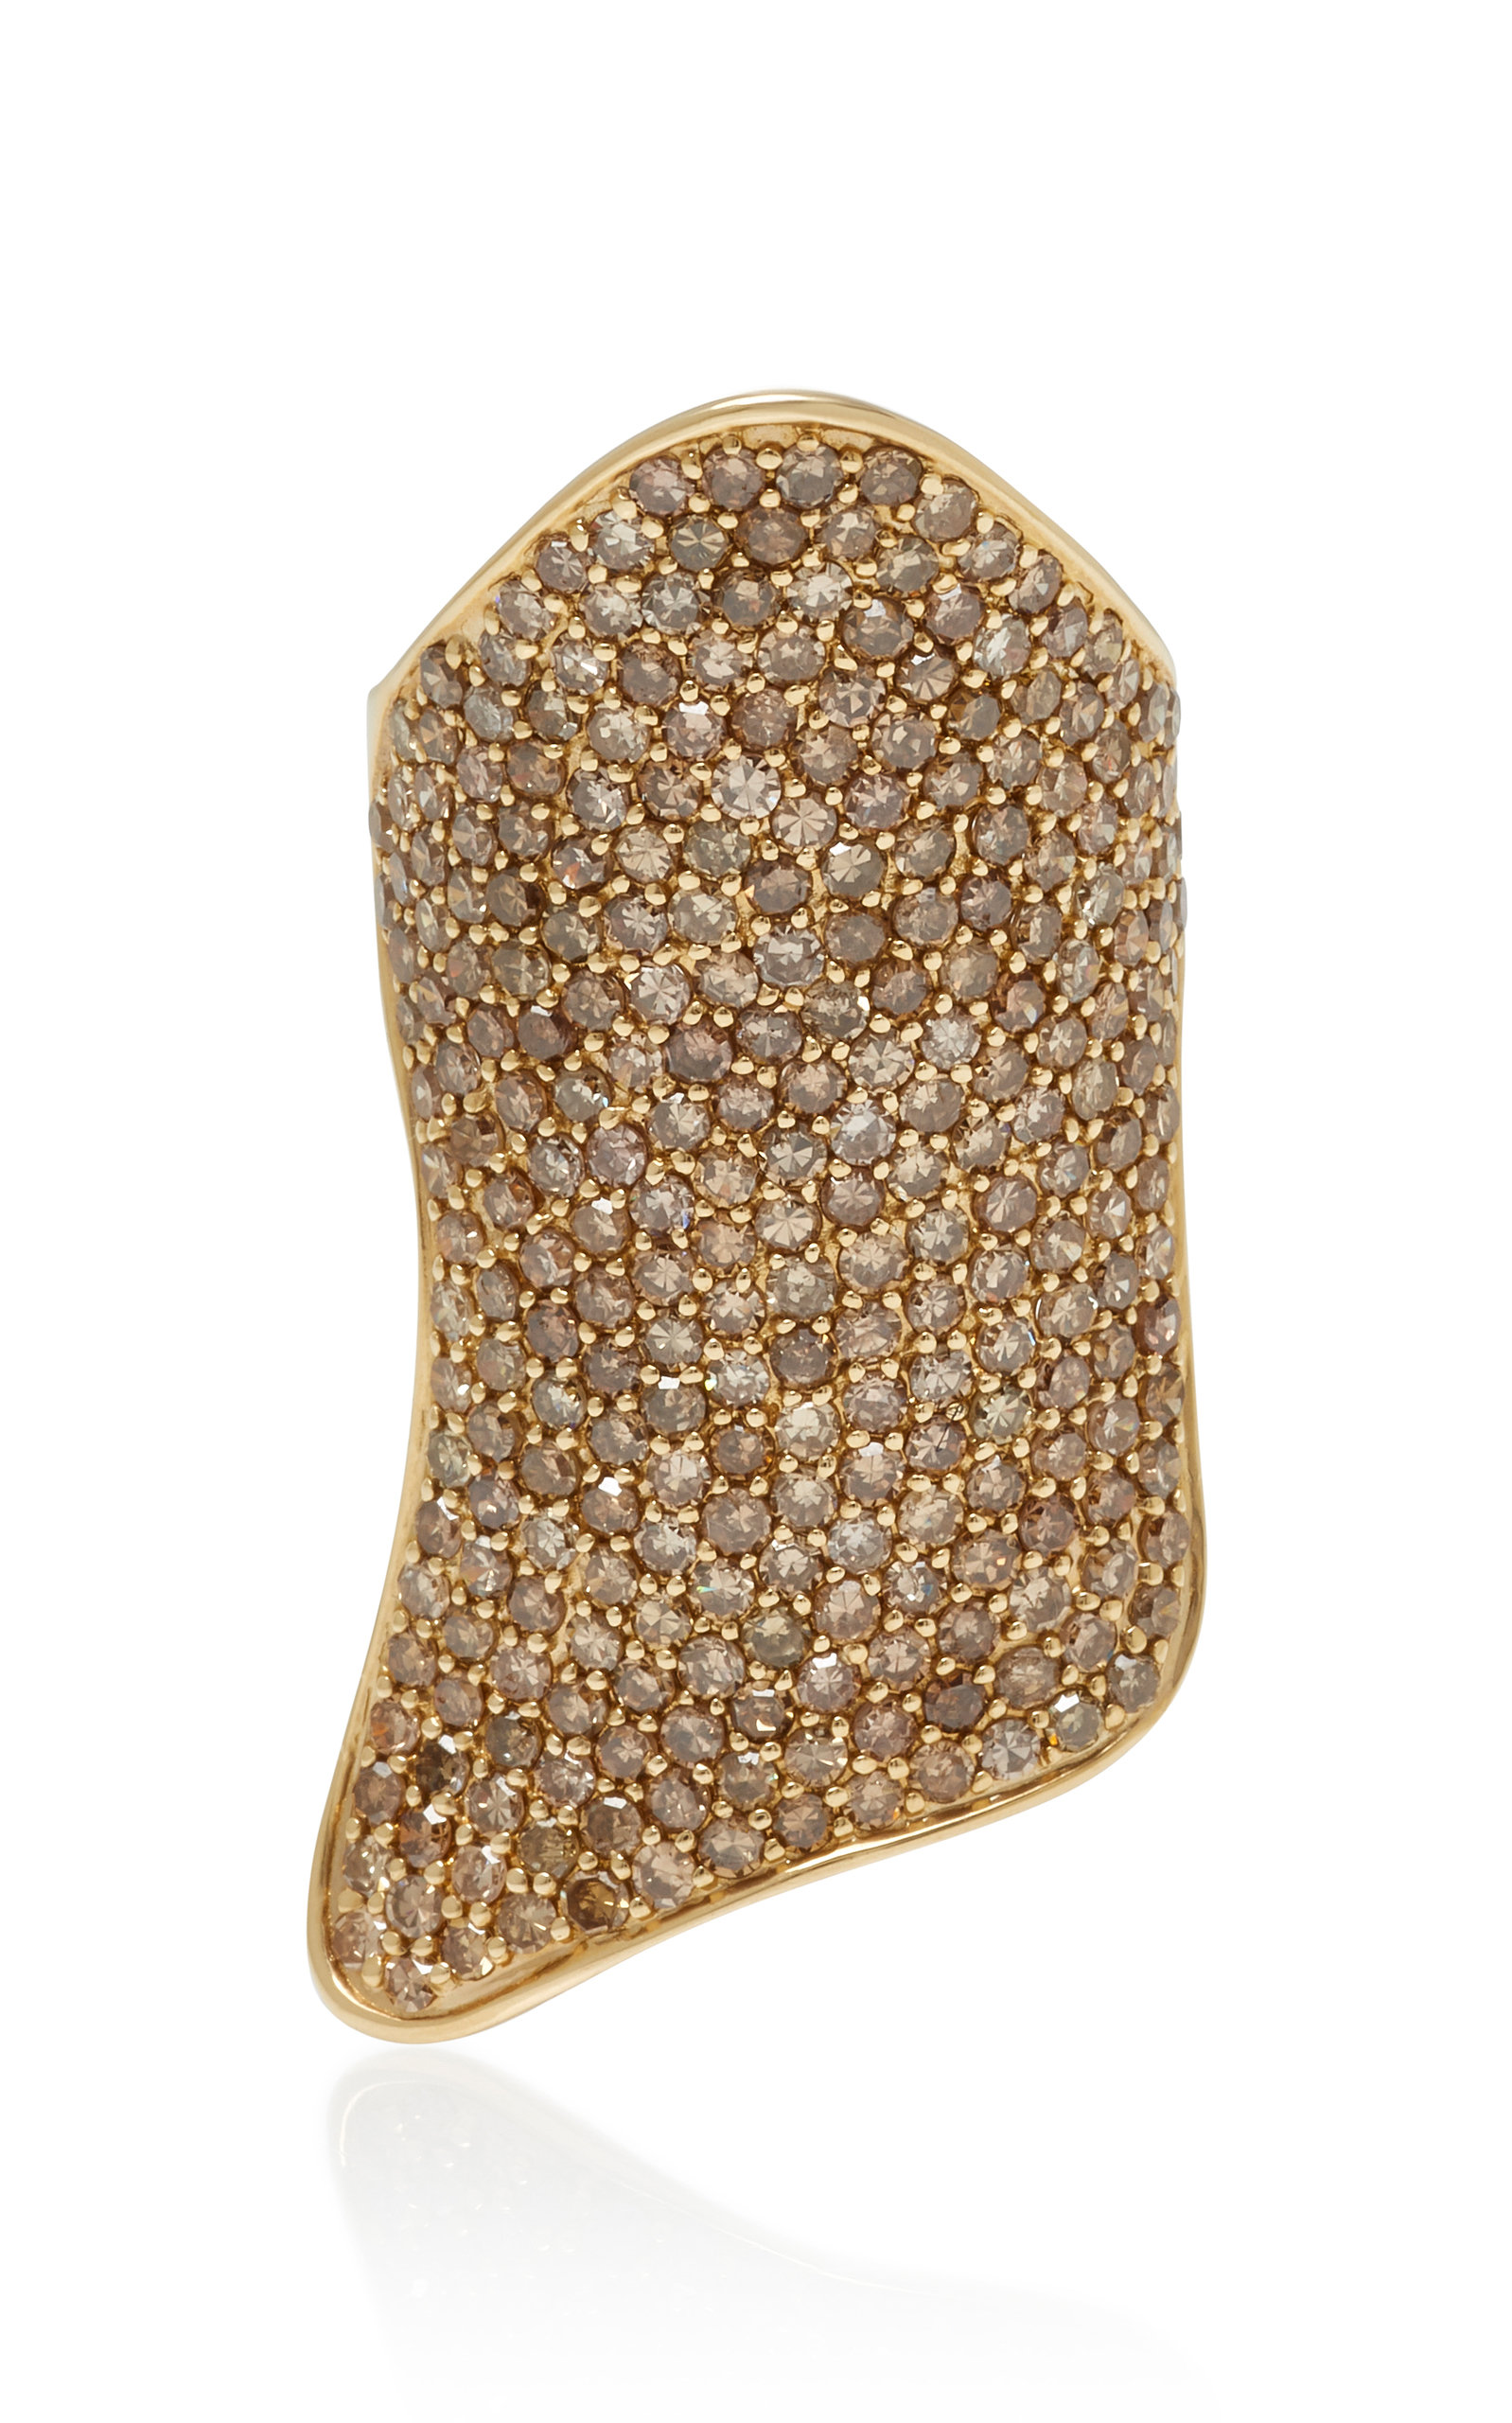 LYNN BAN JEWELRY PAVE ARMOR 14K GOLD DIAMOND RING